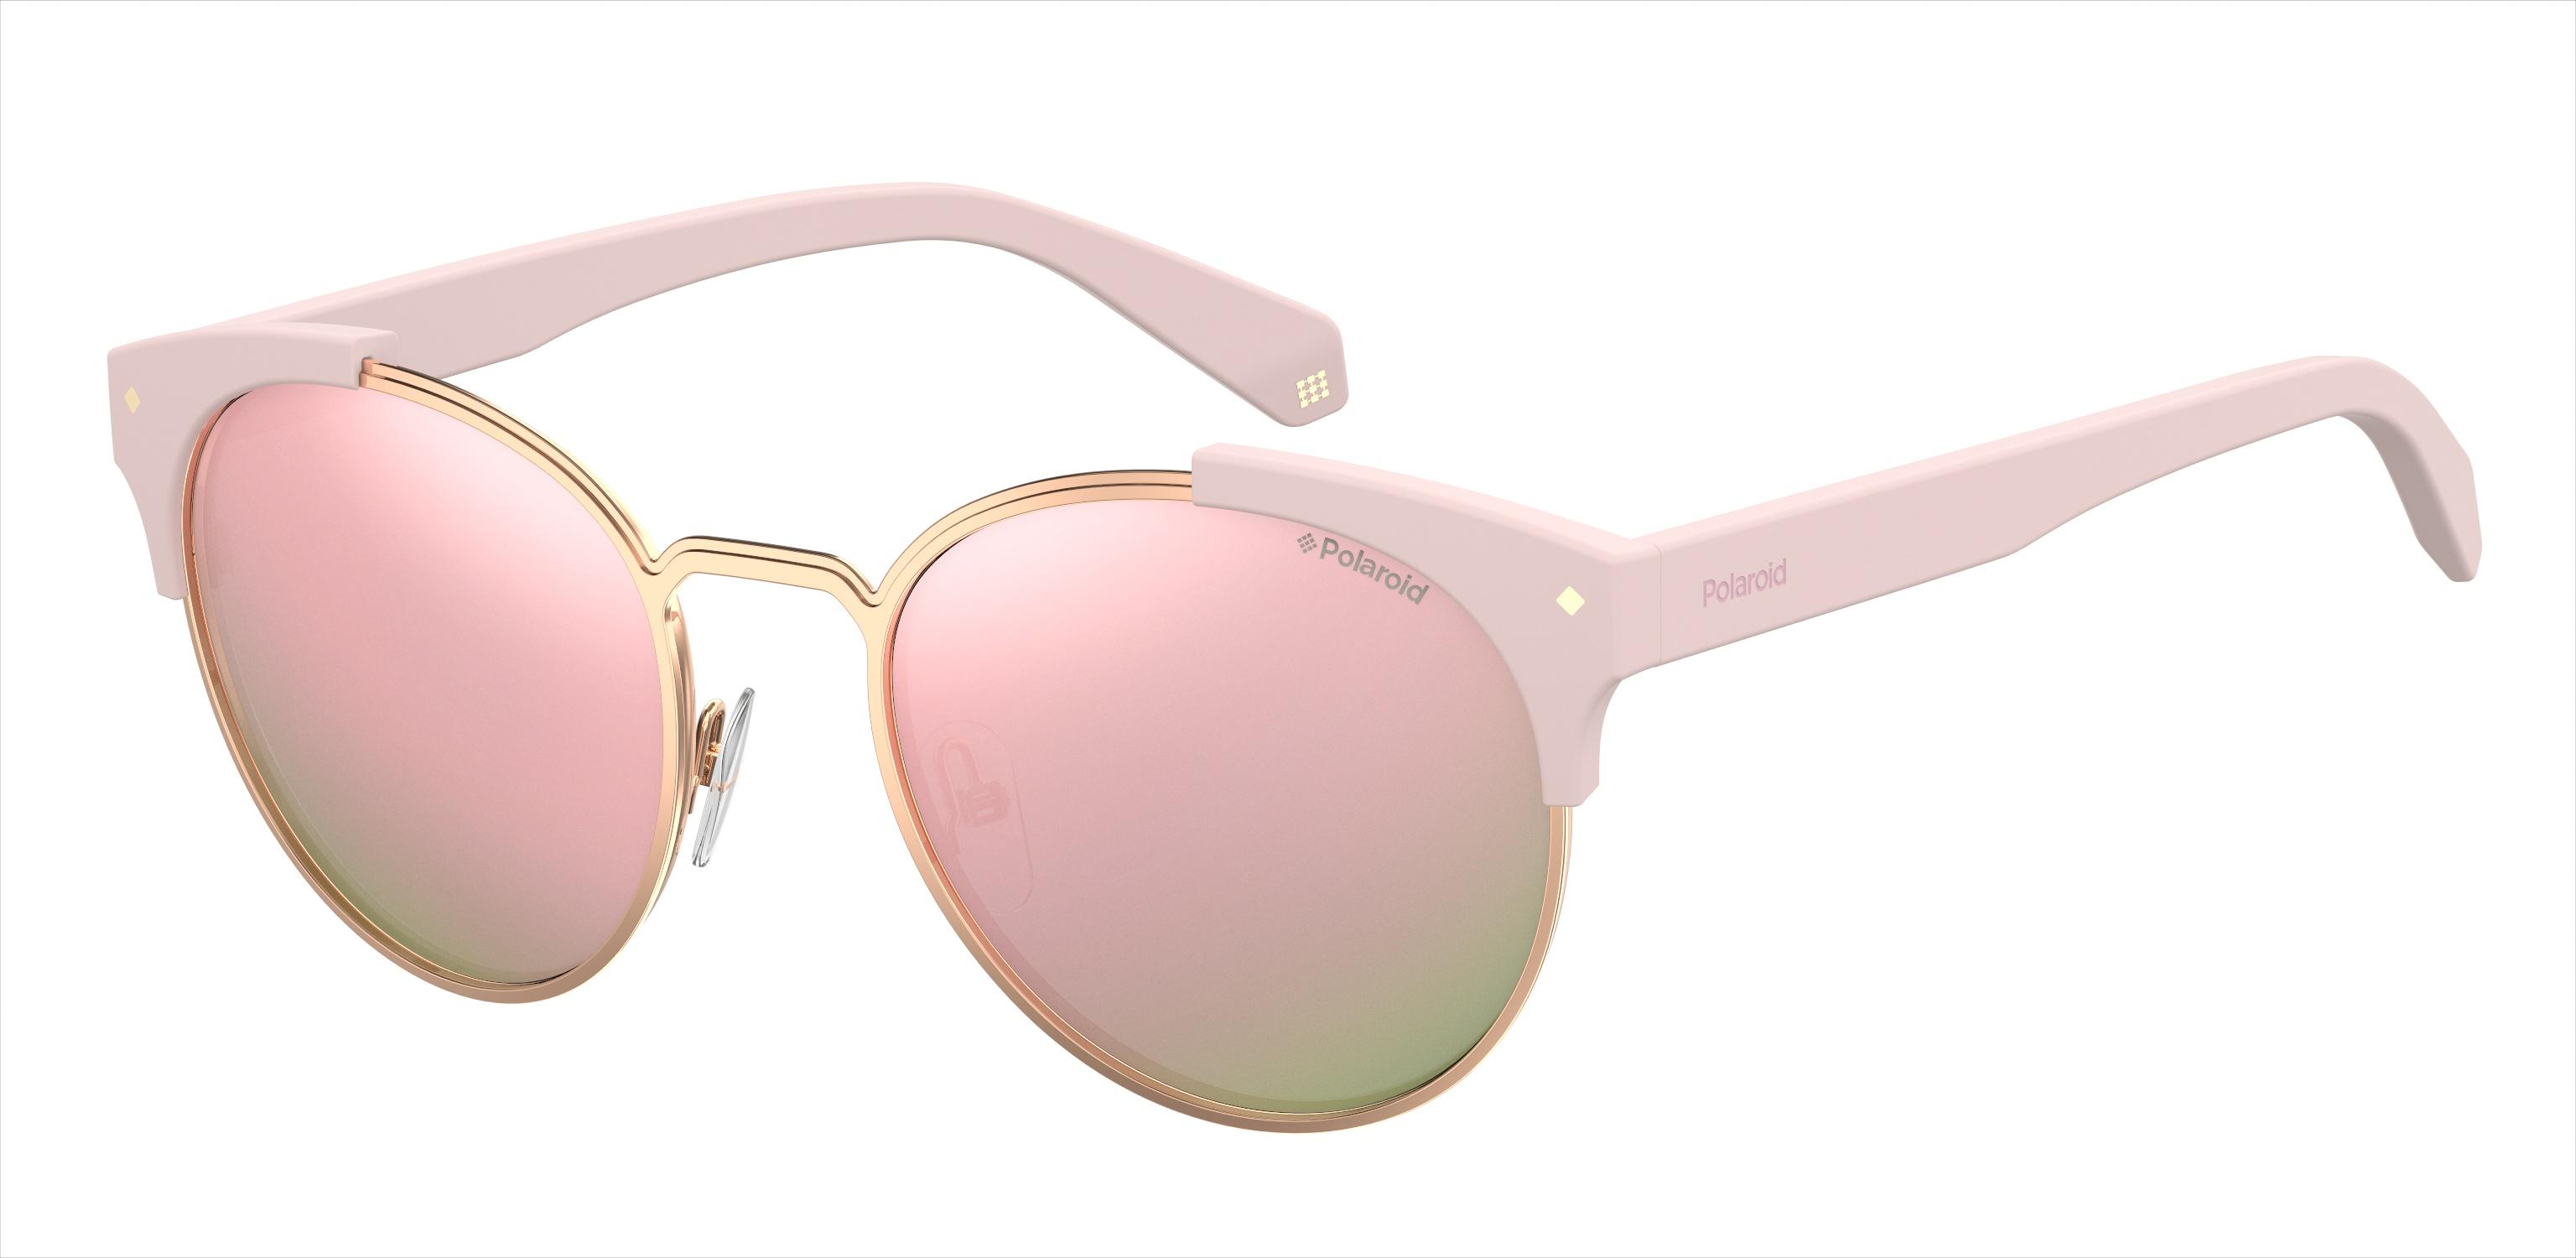 a8643688a7 Newsorama  Τα νέα γυαλιά ηλίου Polaroid δίνουν και άλλο χρώμα στο καλοκαίρι  σου